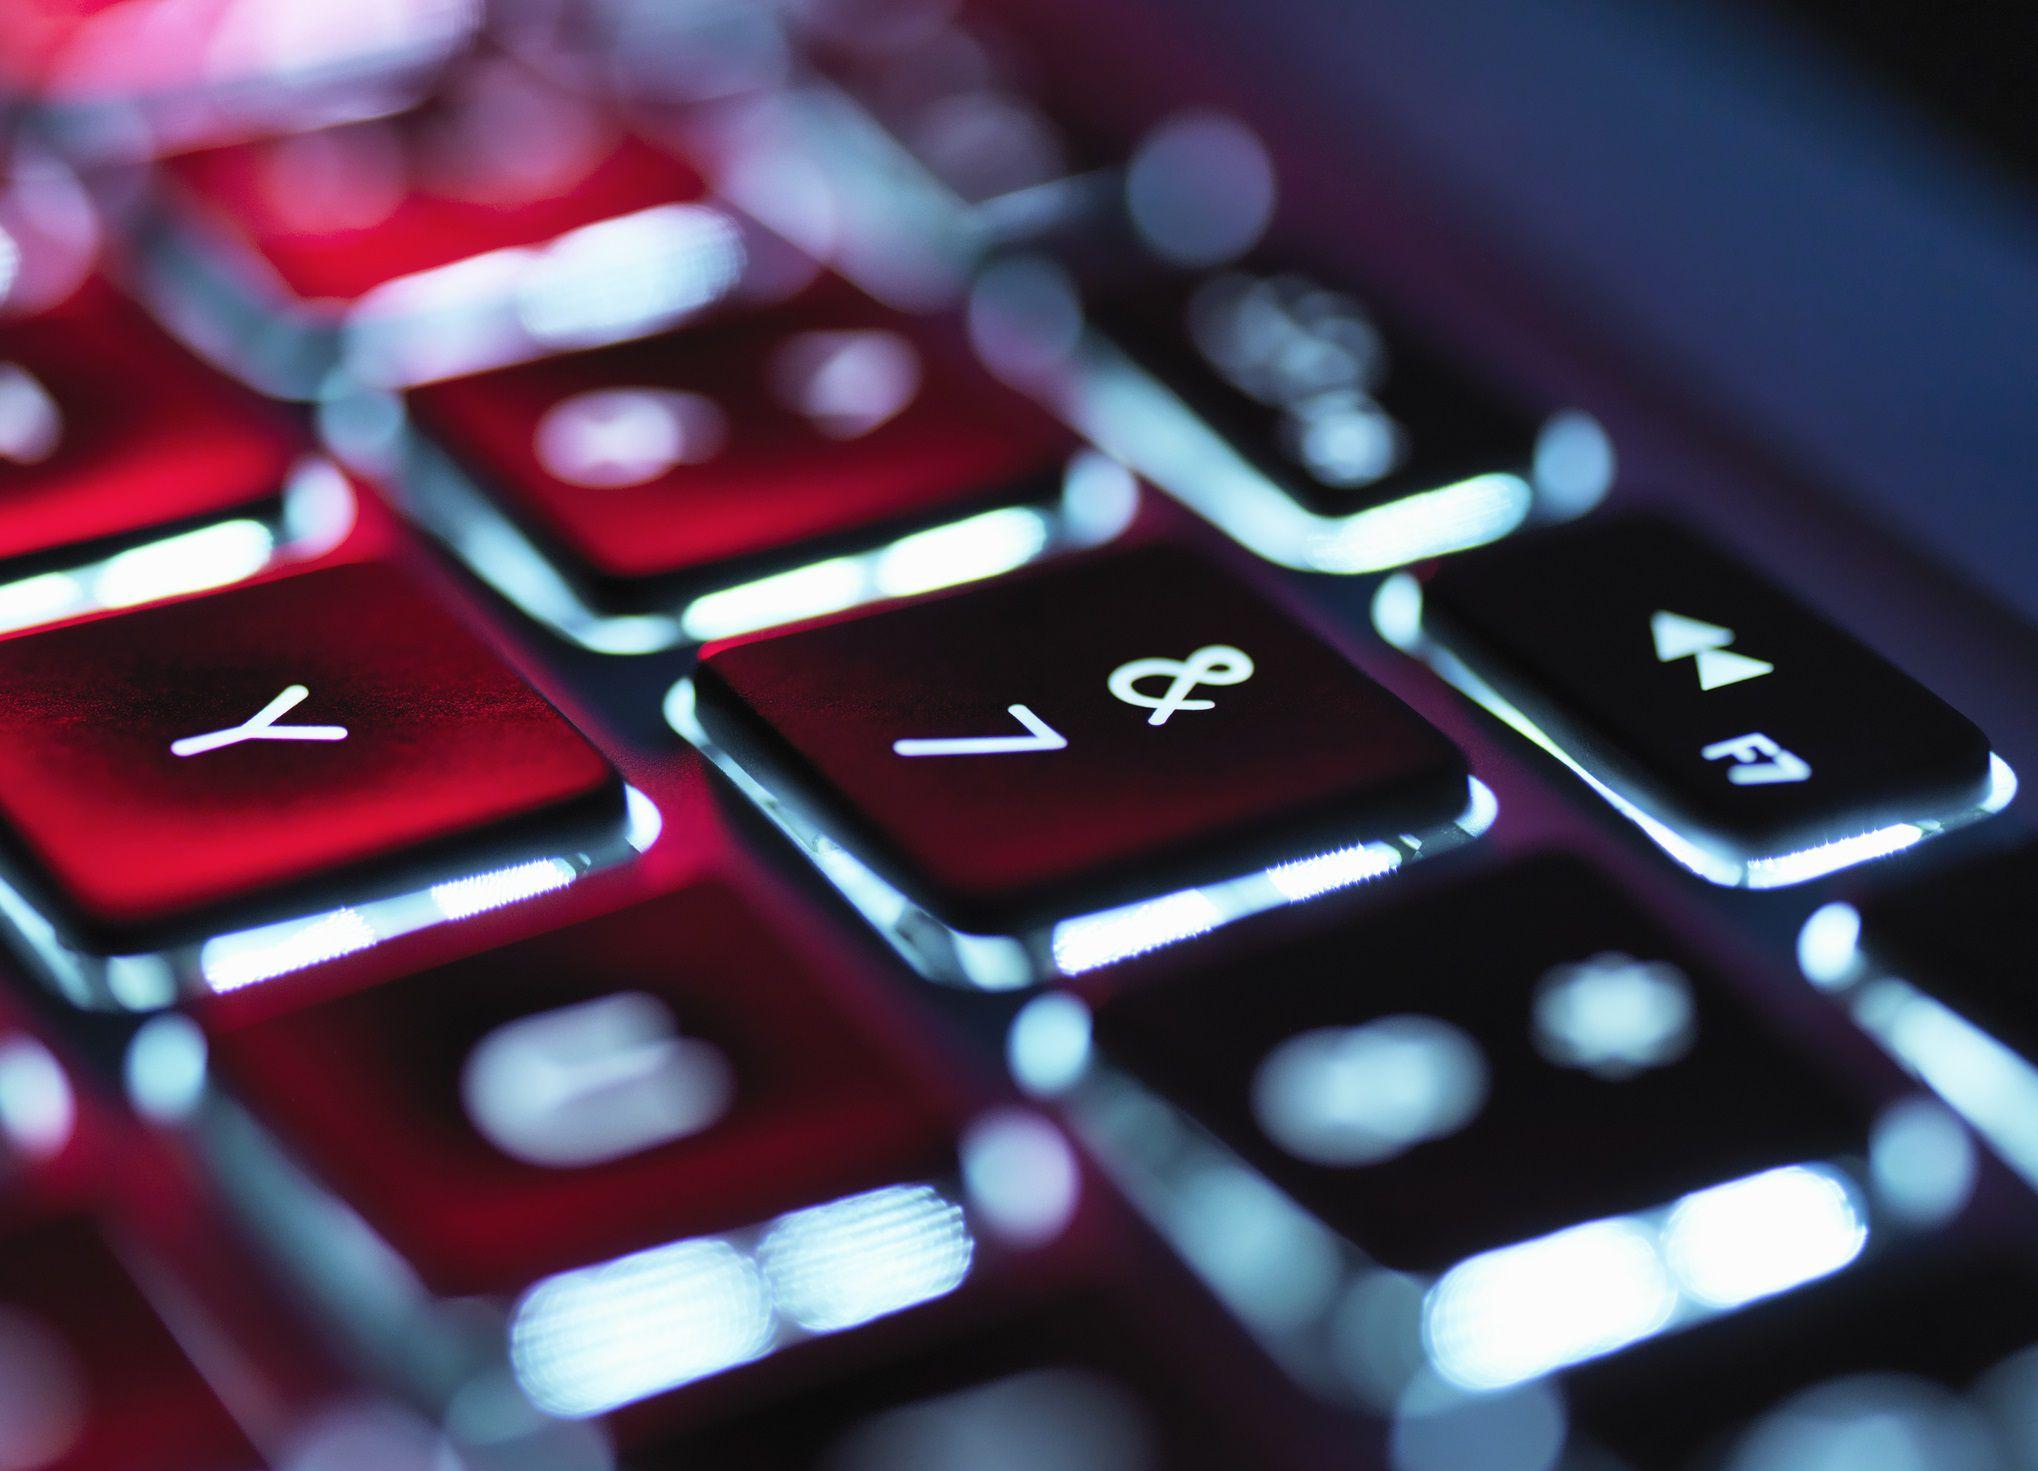 Common Keyboard Symbols